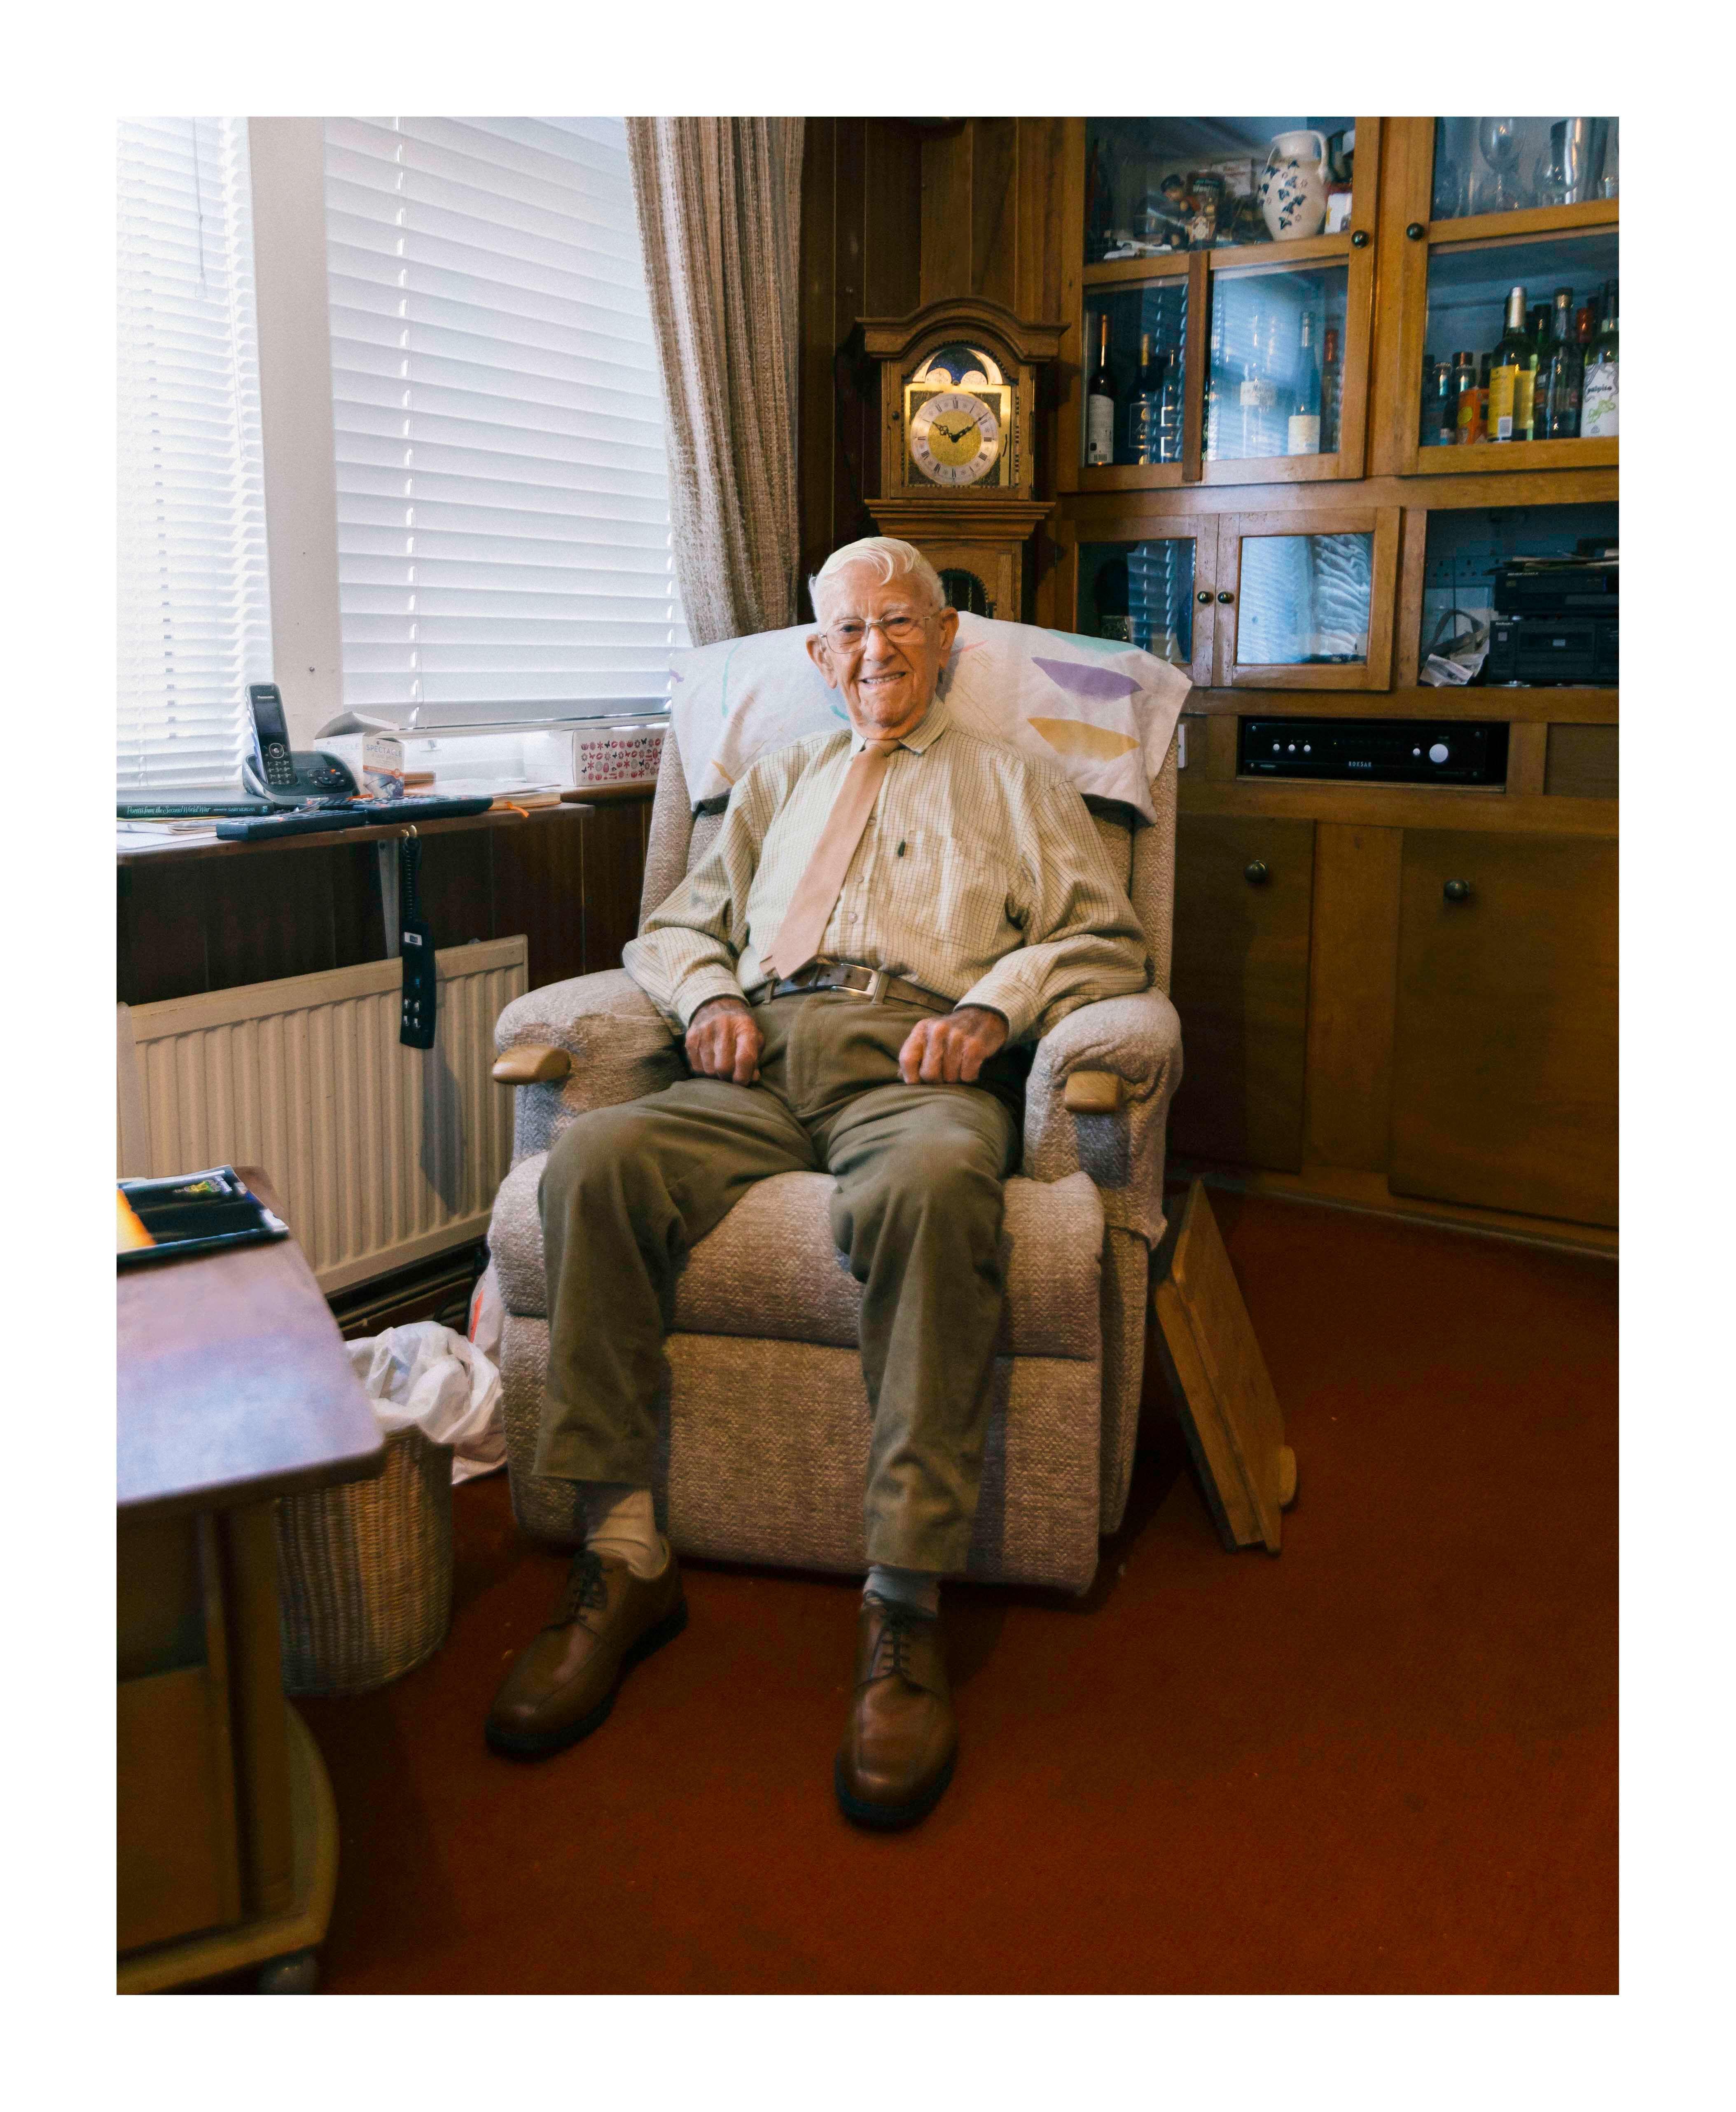 Garth Wright ww2 veteran second world war Dunkirk hero photography photographer